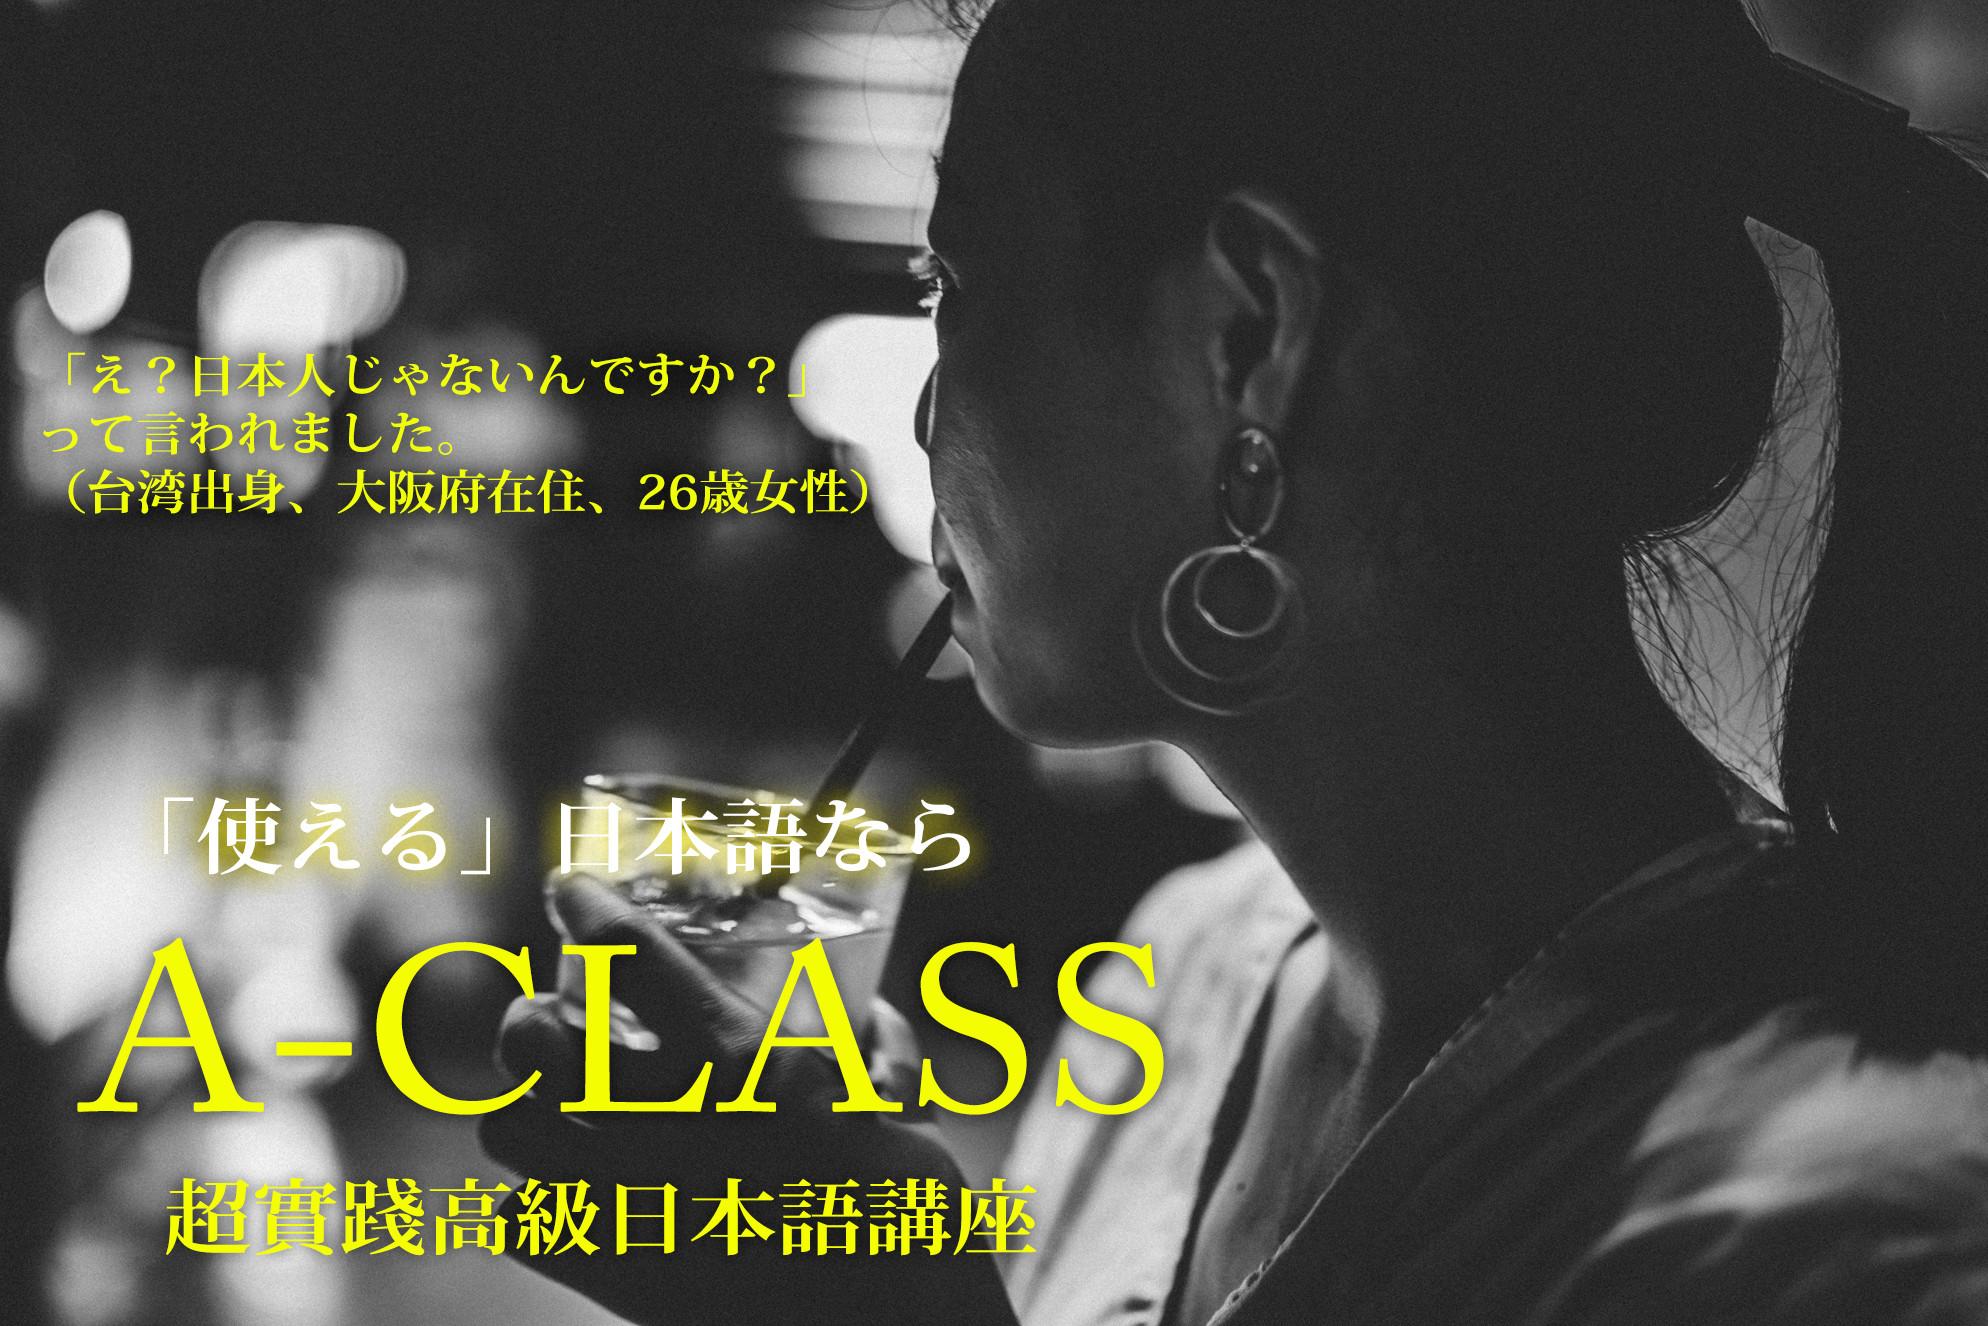 A-CLASS「超實踐高級日本語講座」2020年1月課程介紹/2020年1月授業スケジュール